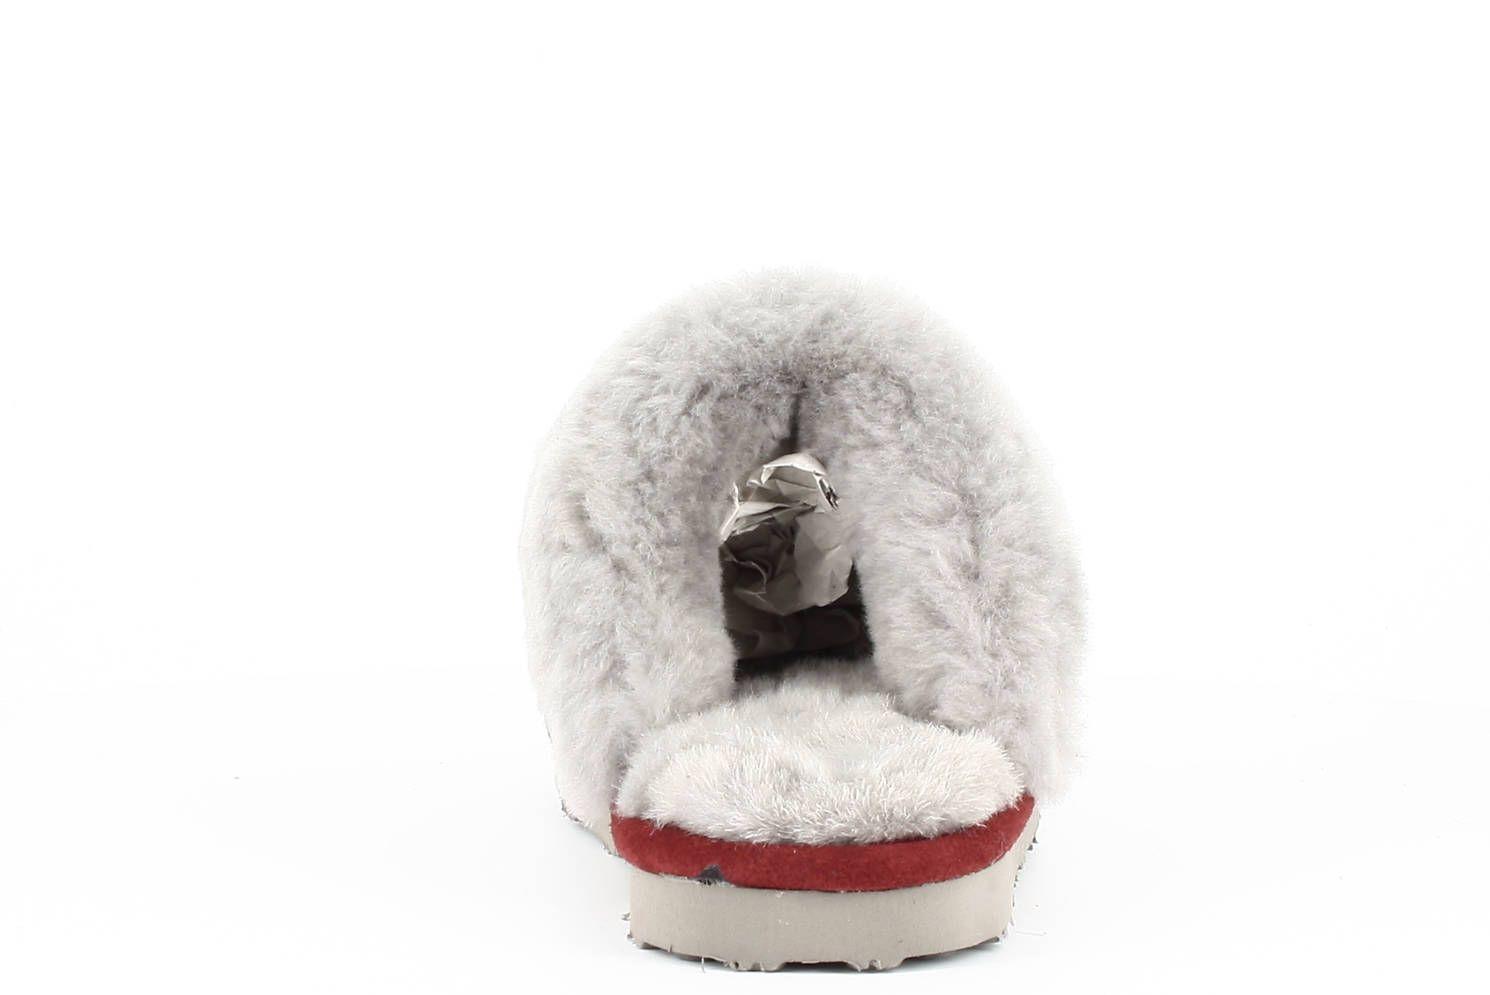 Sheepskin Nancy Mule Slippers in Wine with a Grey Fur Trim